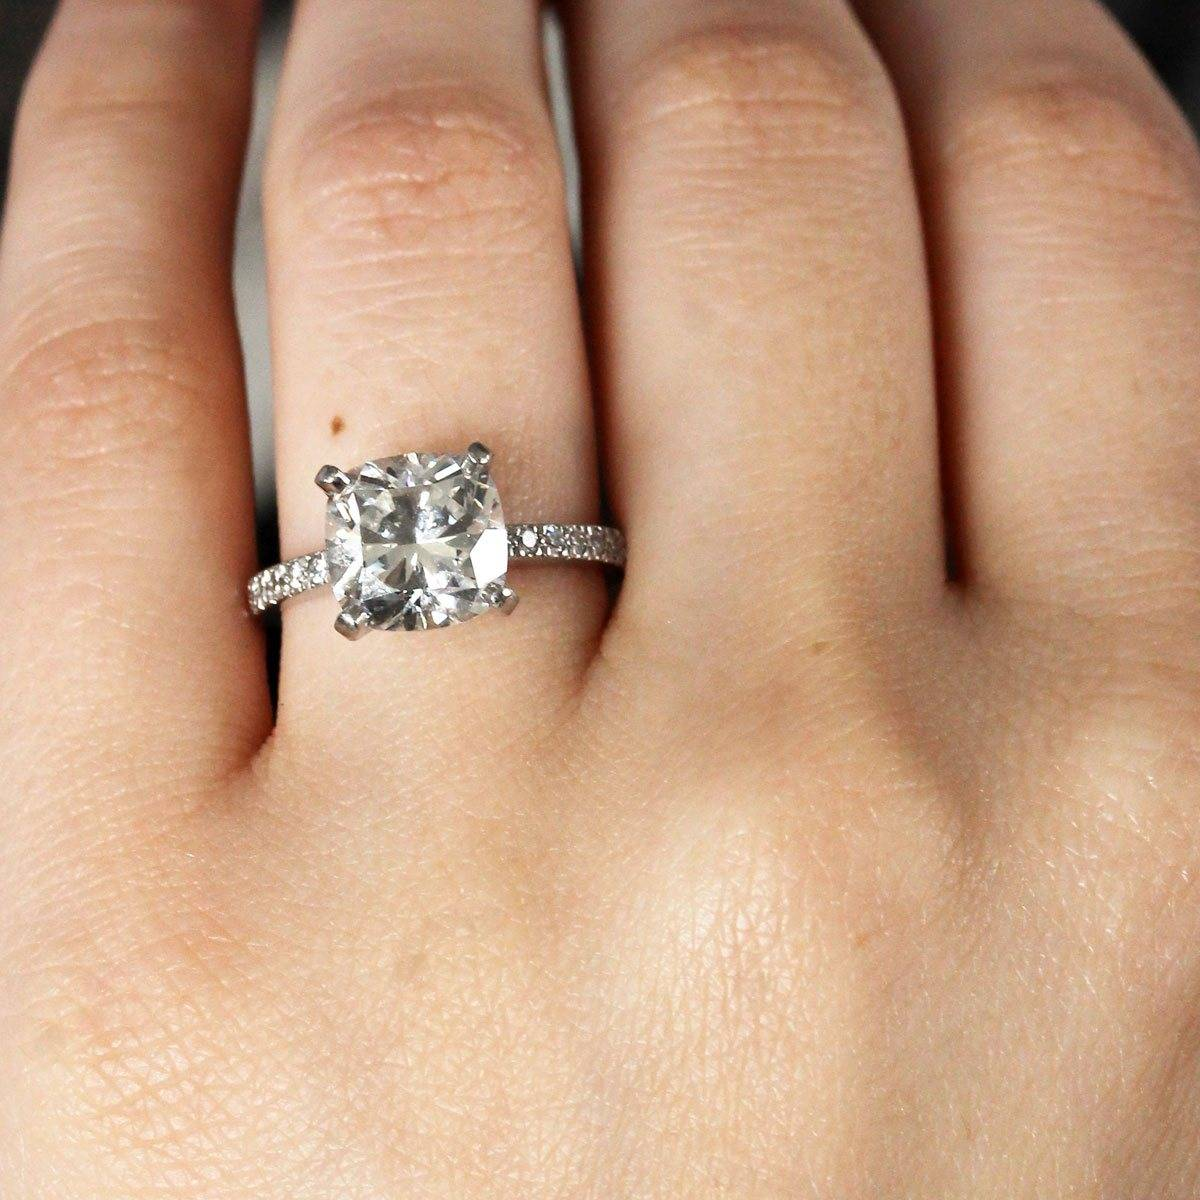 Cushion Cut Engagement Rings NO Halo Raymond Lee Jewelers